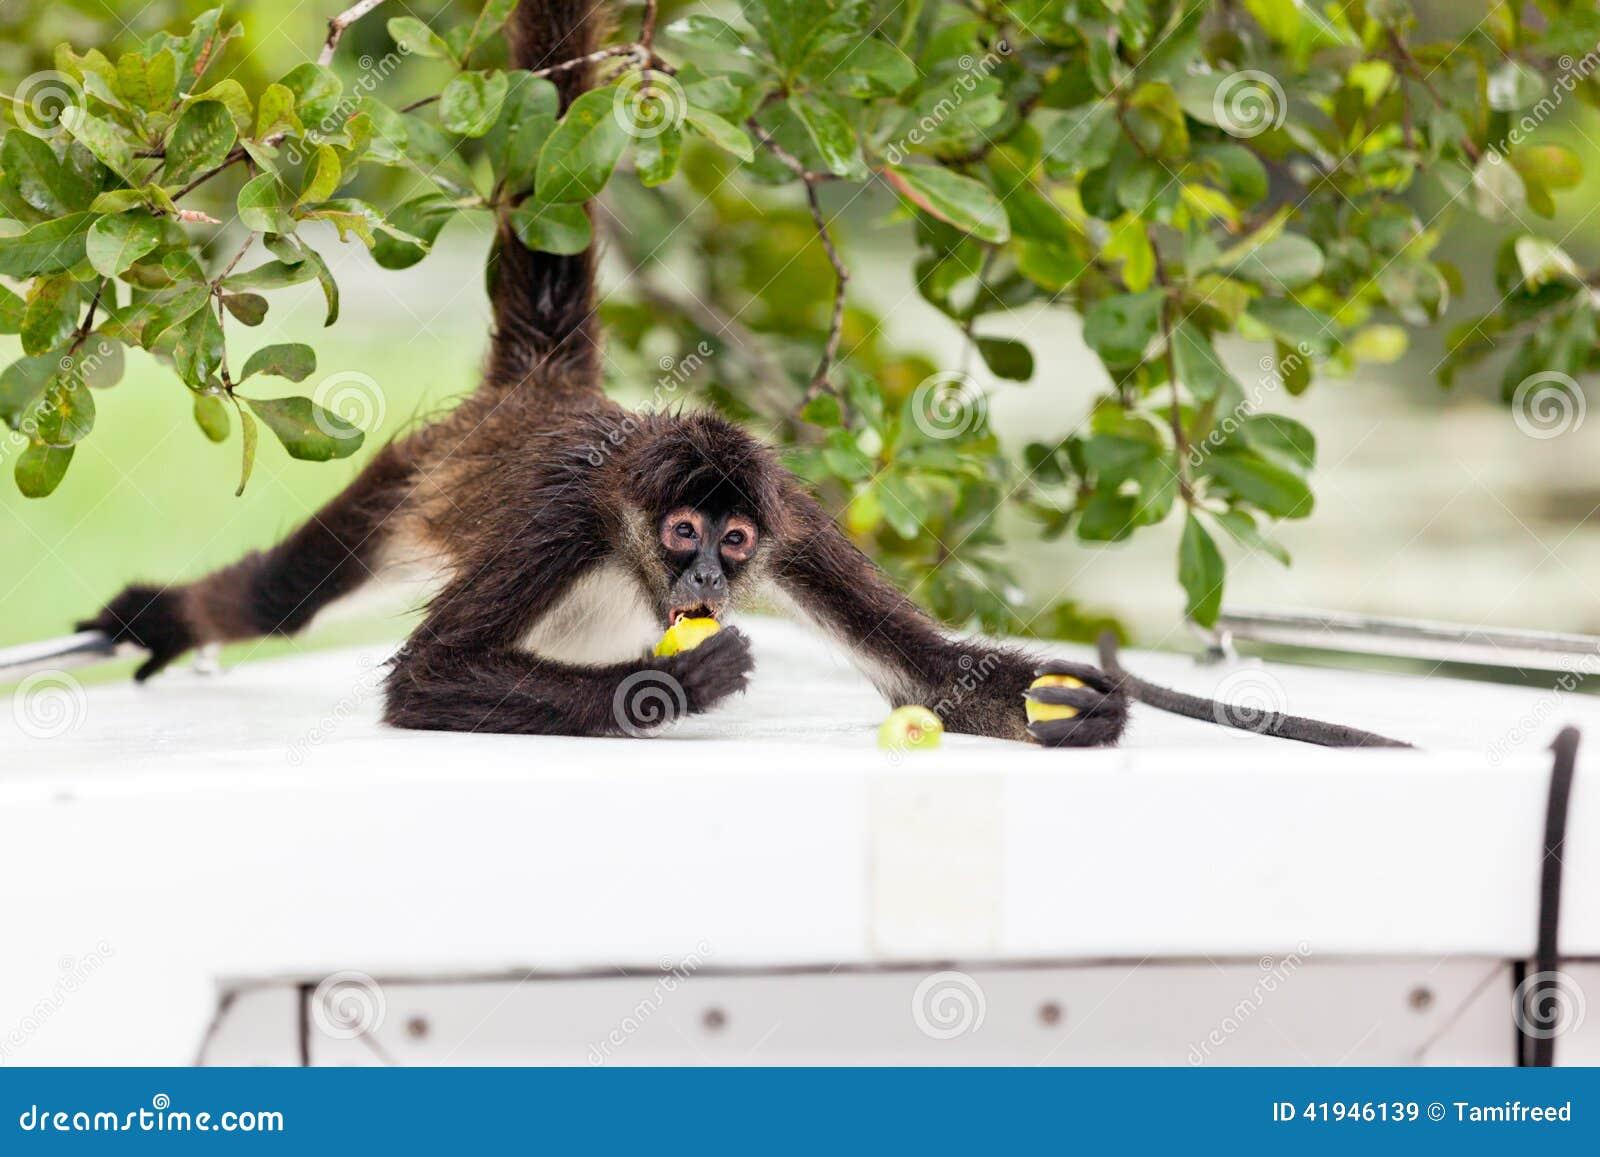 Spider Monkey Eating Guava Stock Photo Image: 41946120